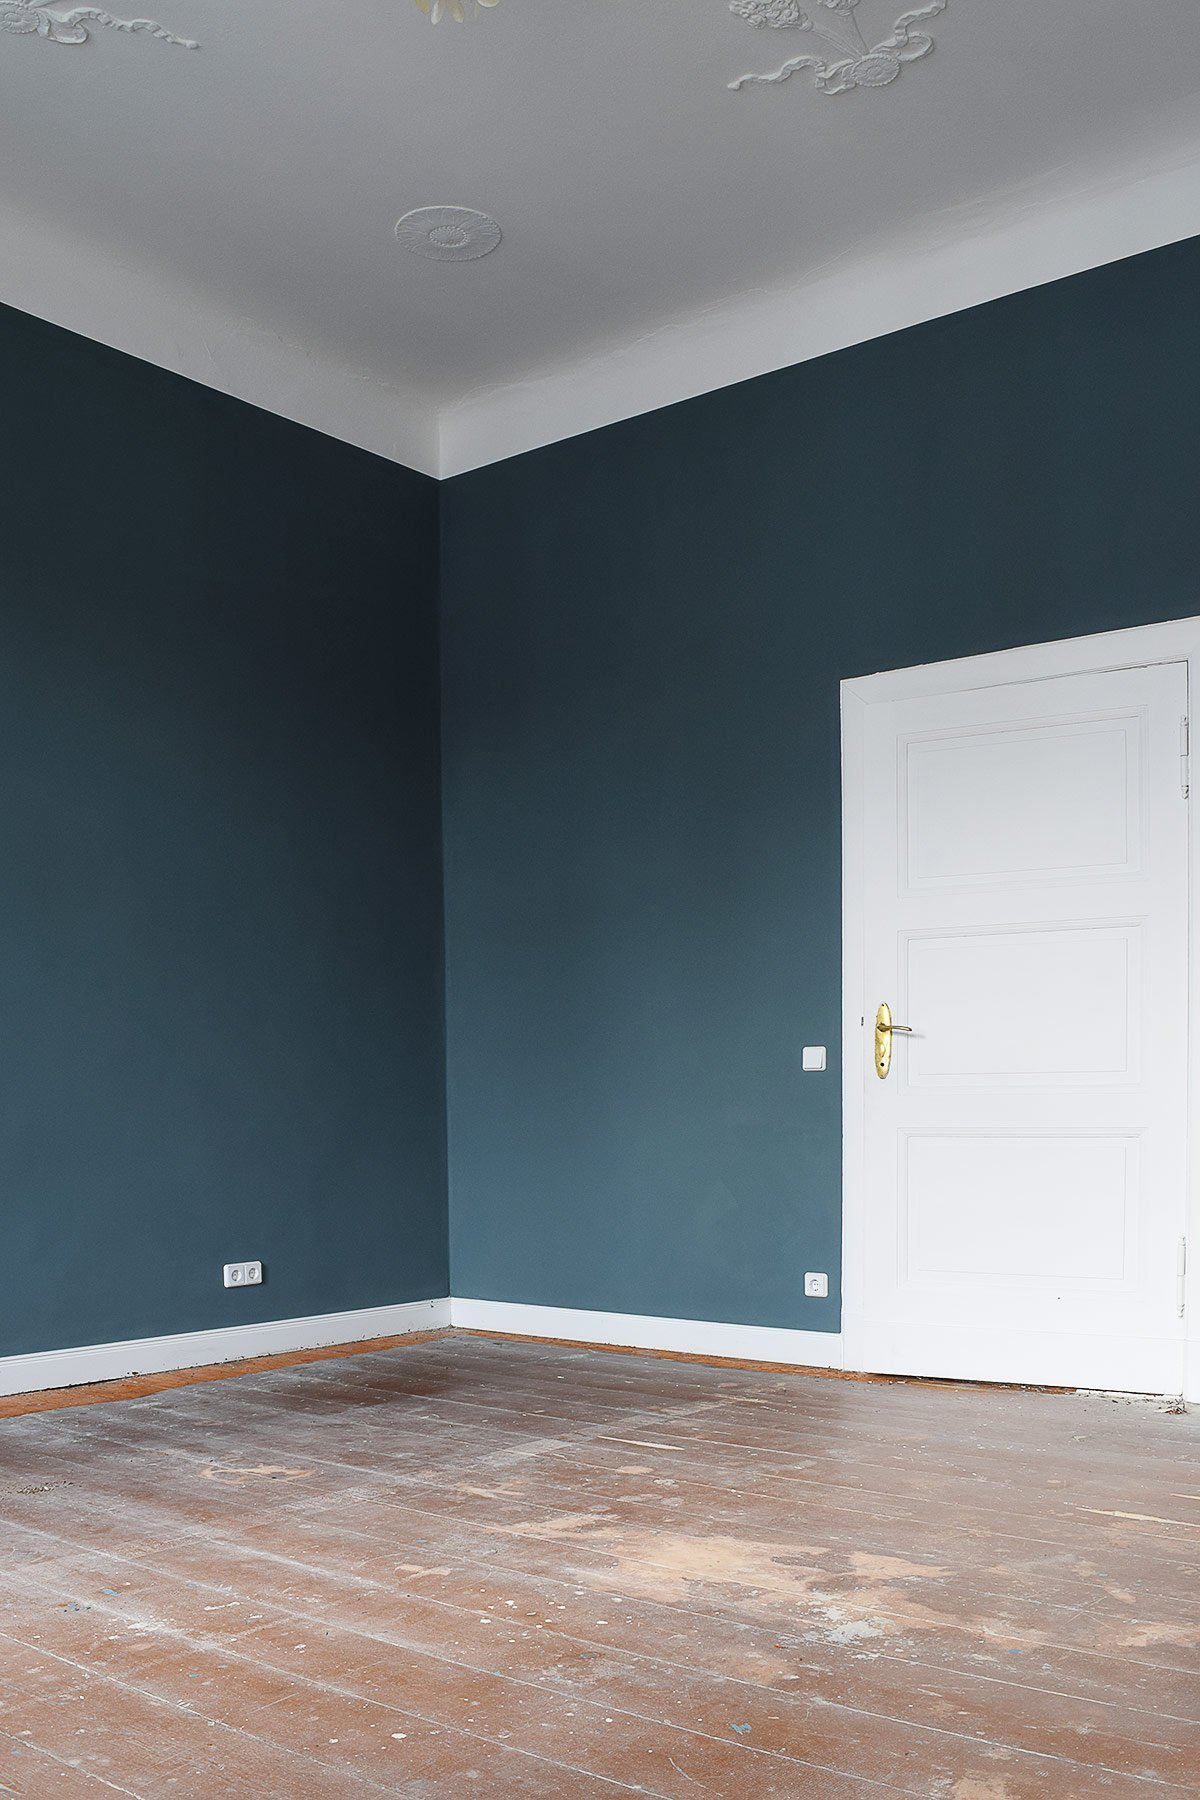 Bedroom Inchyra Blue In Progress | Little House On The Corner